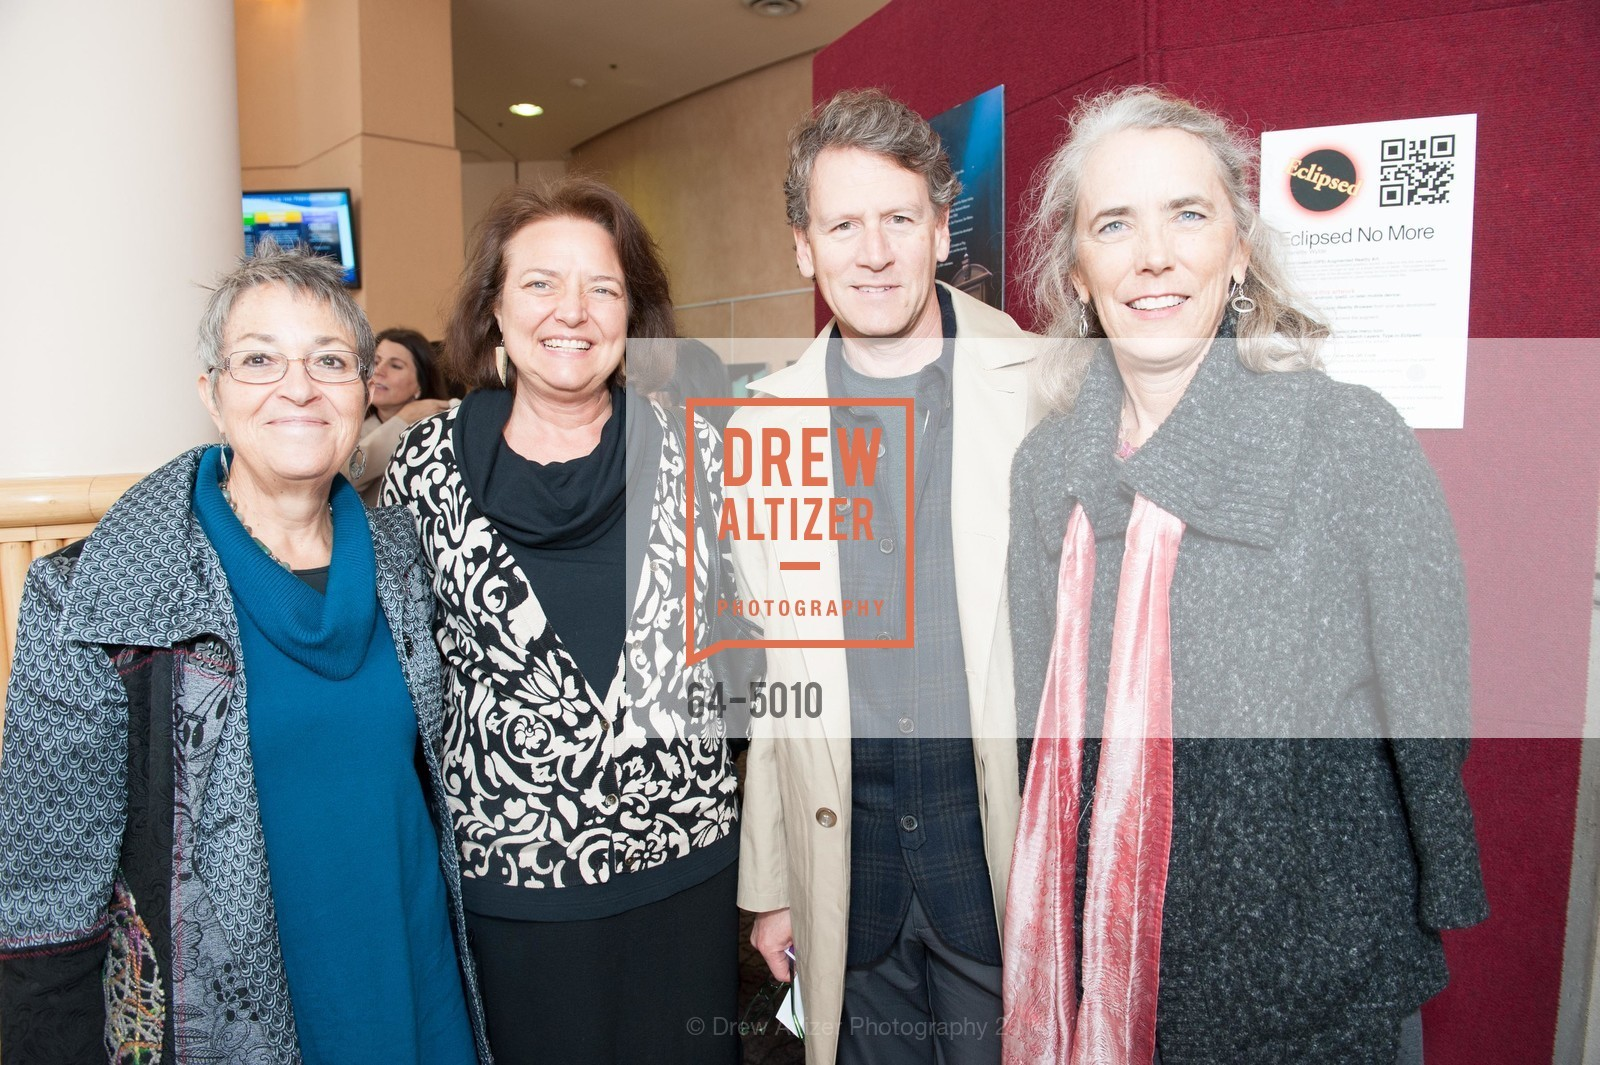 Lisa Webster, Linda Stevenin, Daniel Garber, Catherine Garber, Photo #64-5010